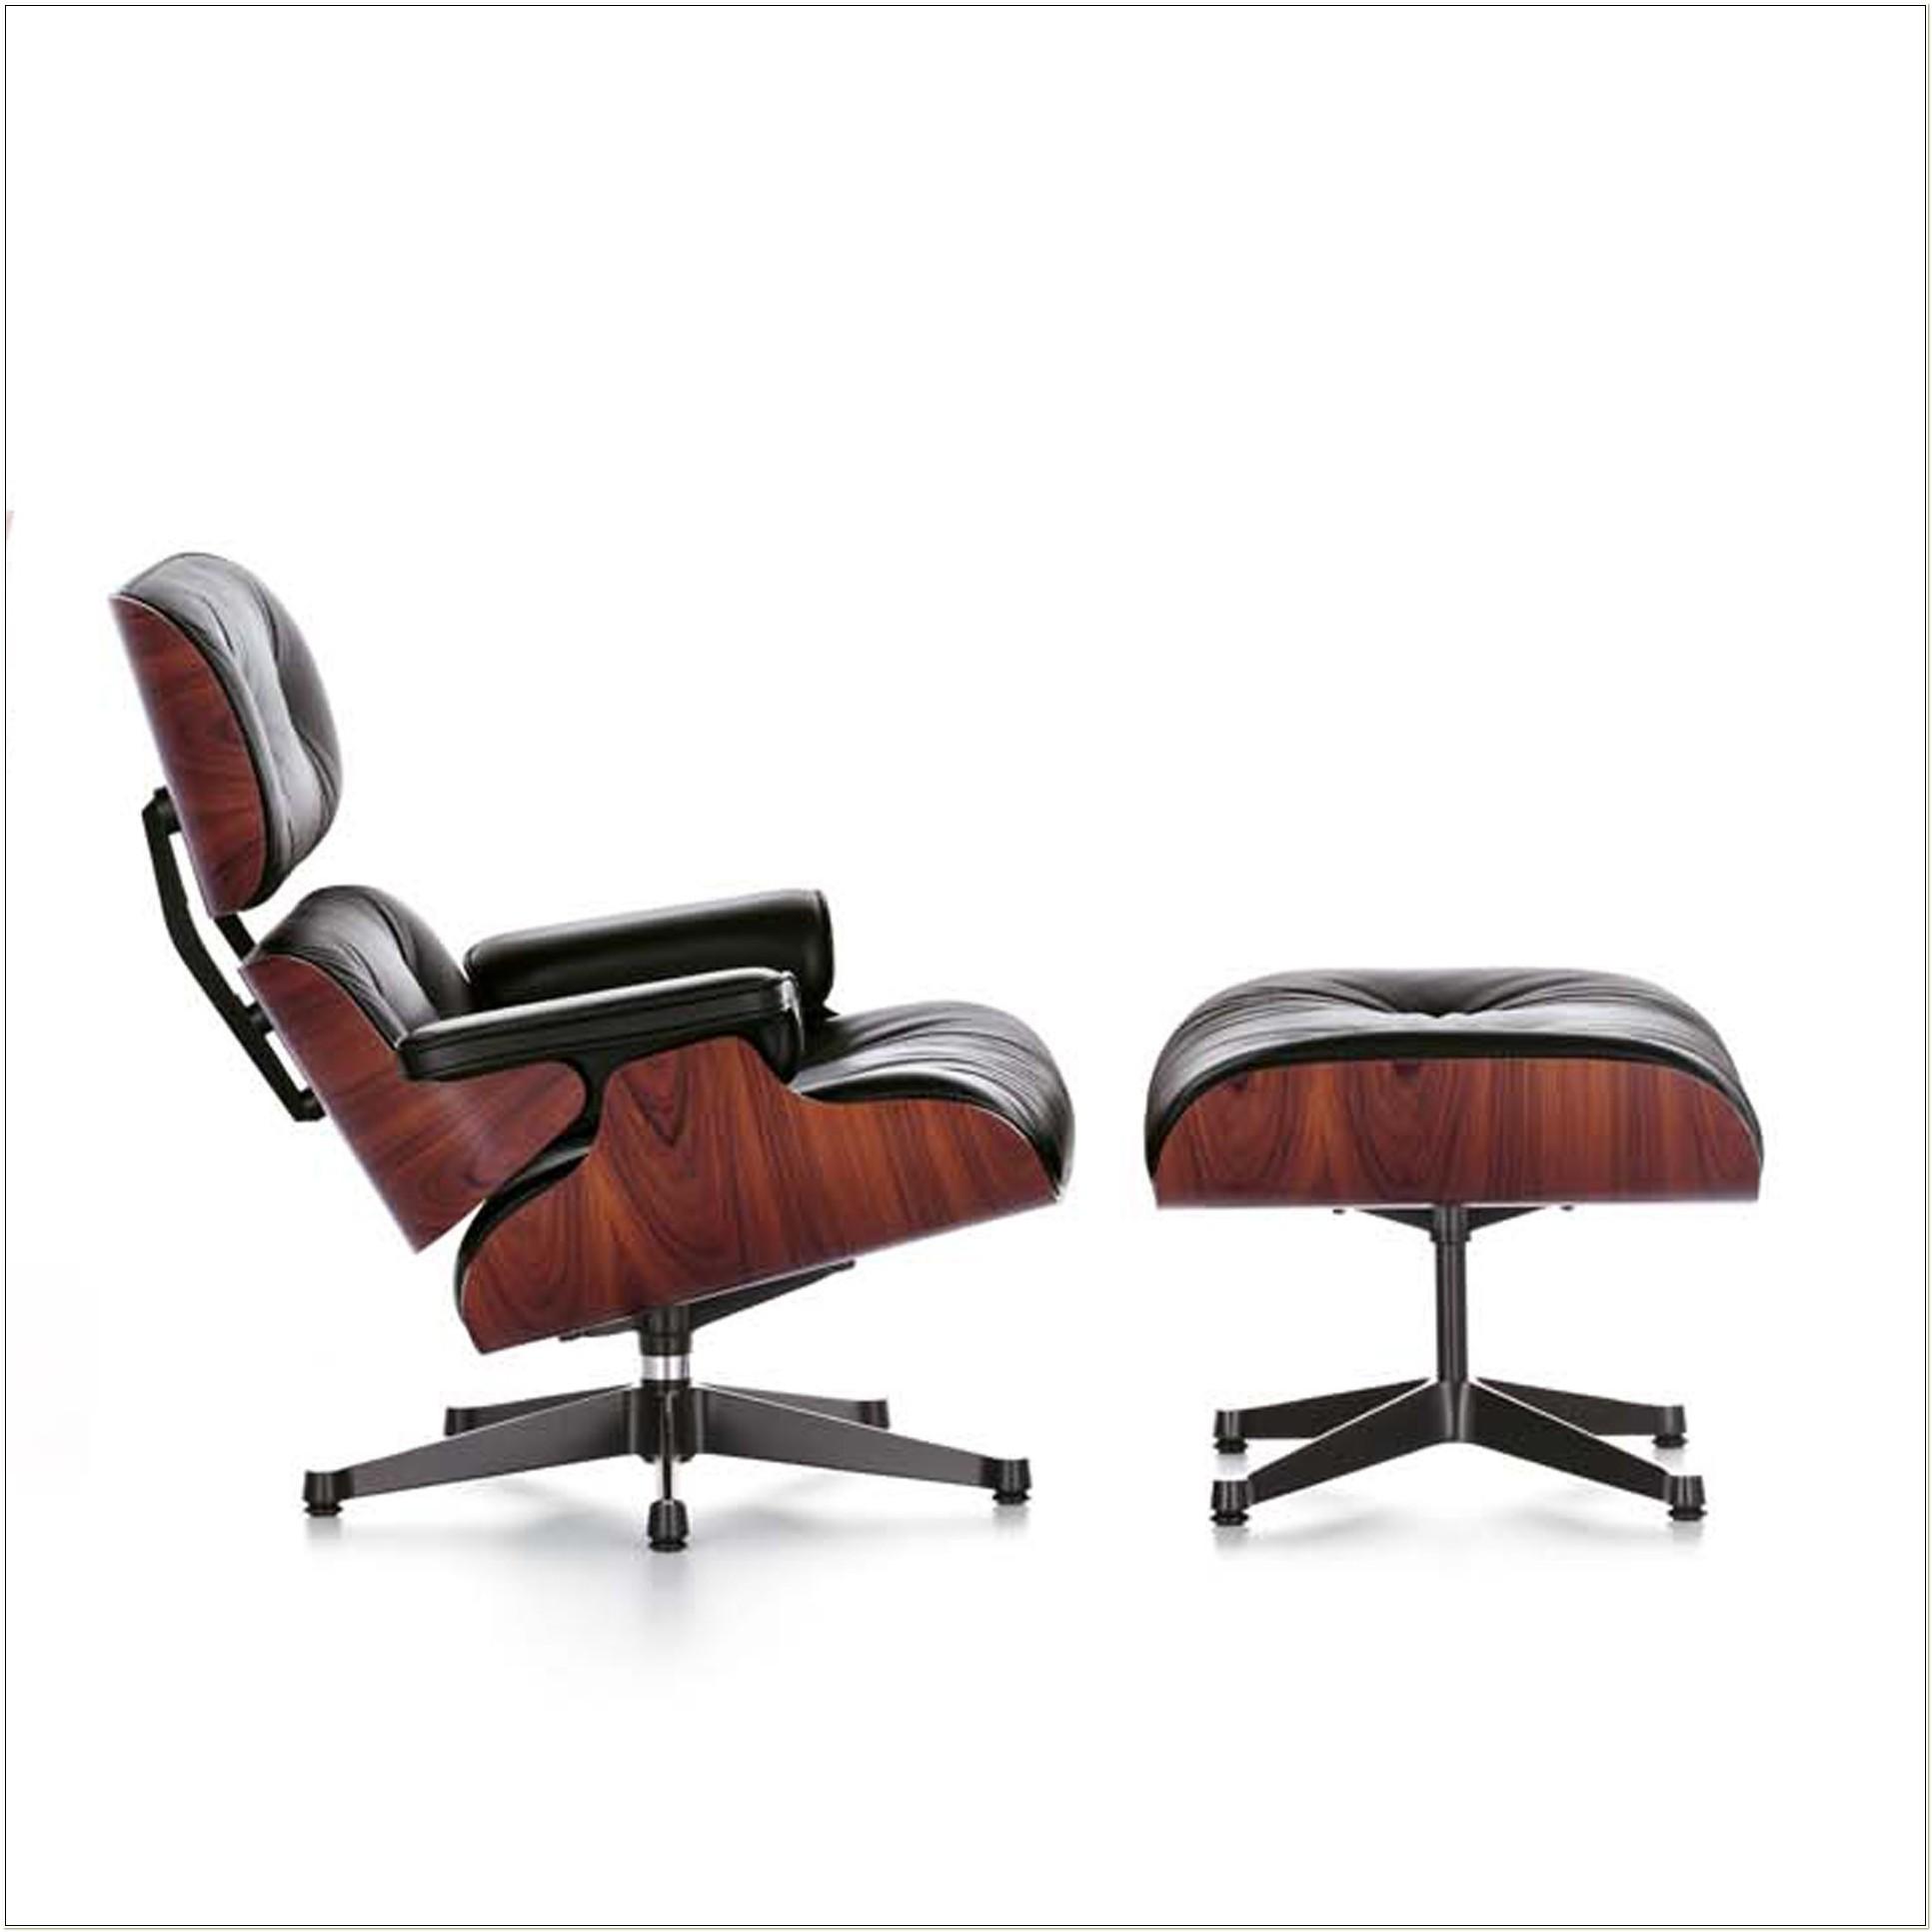 Eames Lounge Chair Ottoman Vitra